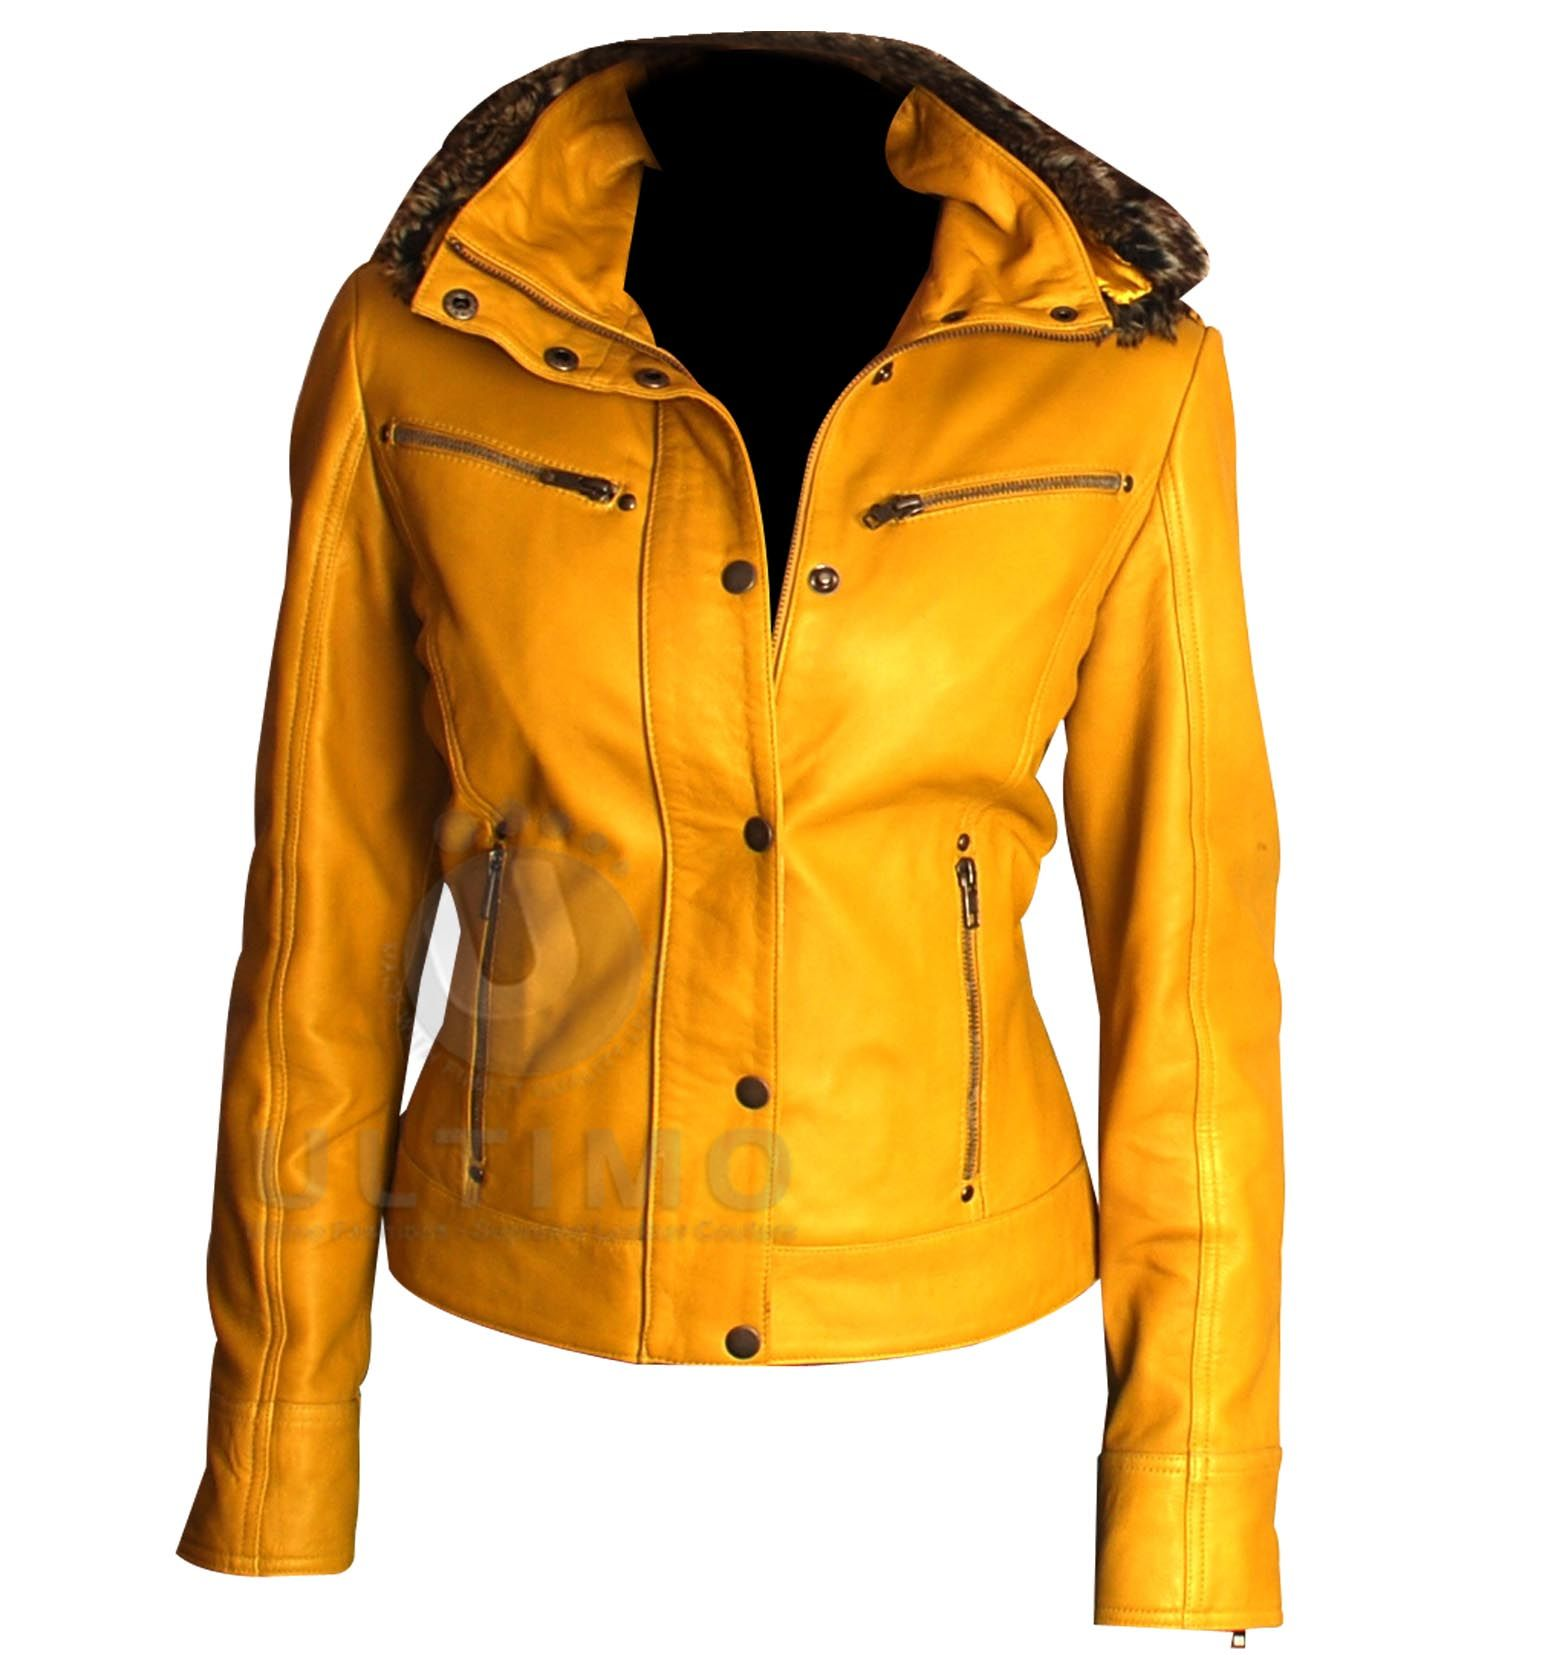 Women's Yellow Hooded Fur Biker Leather Jacket Leather